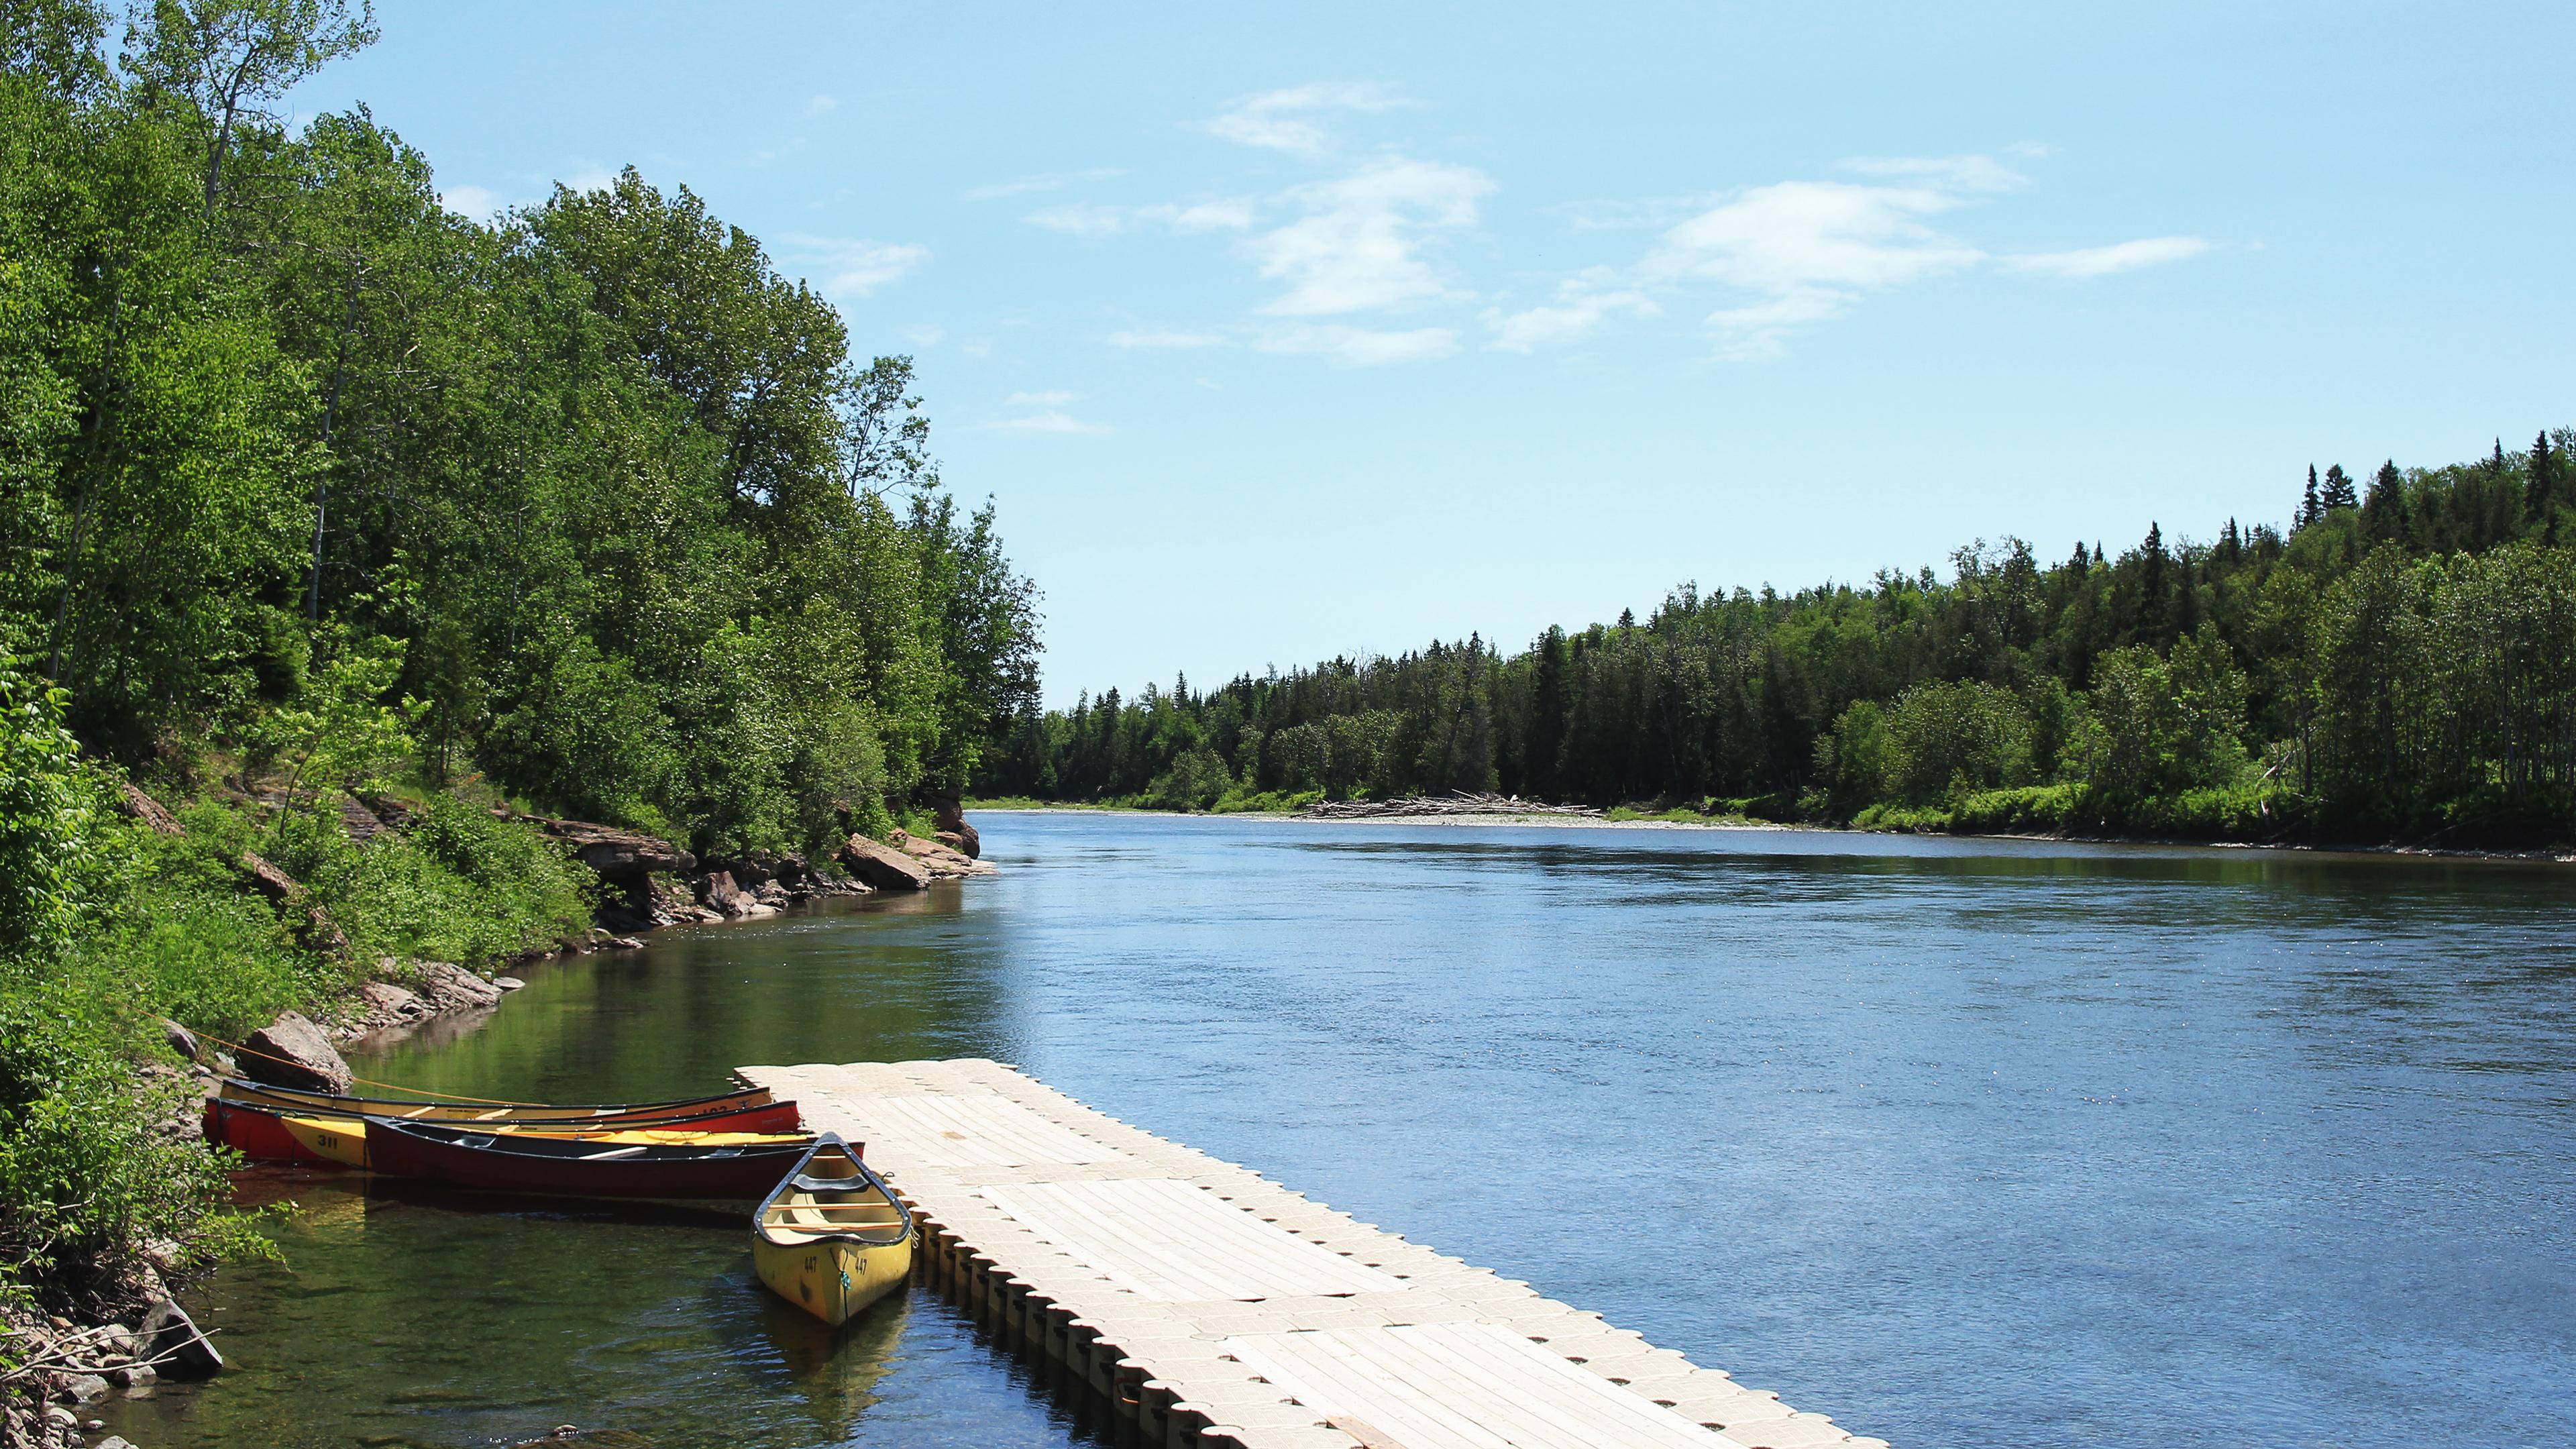 canoe-riviere-canada